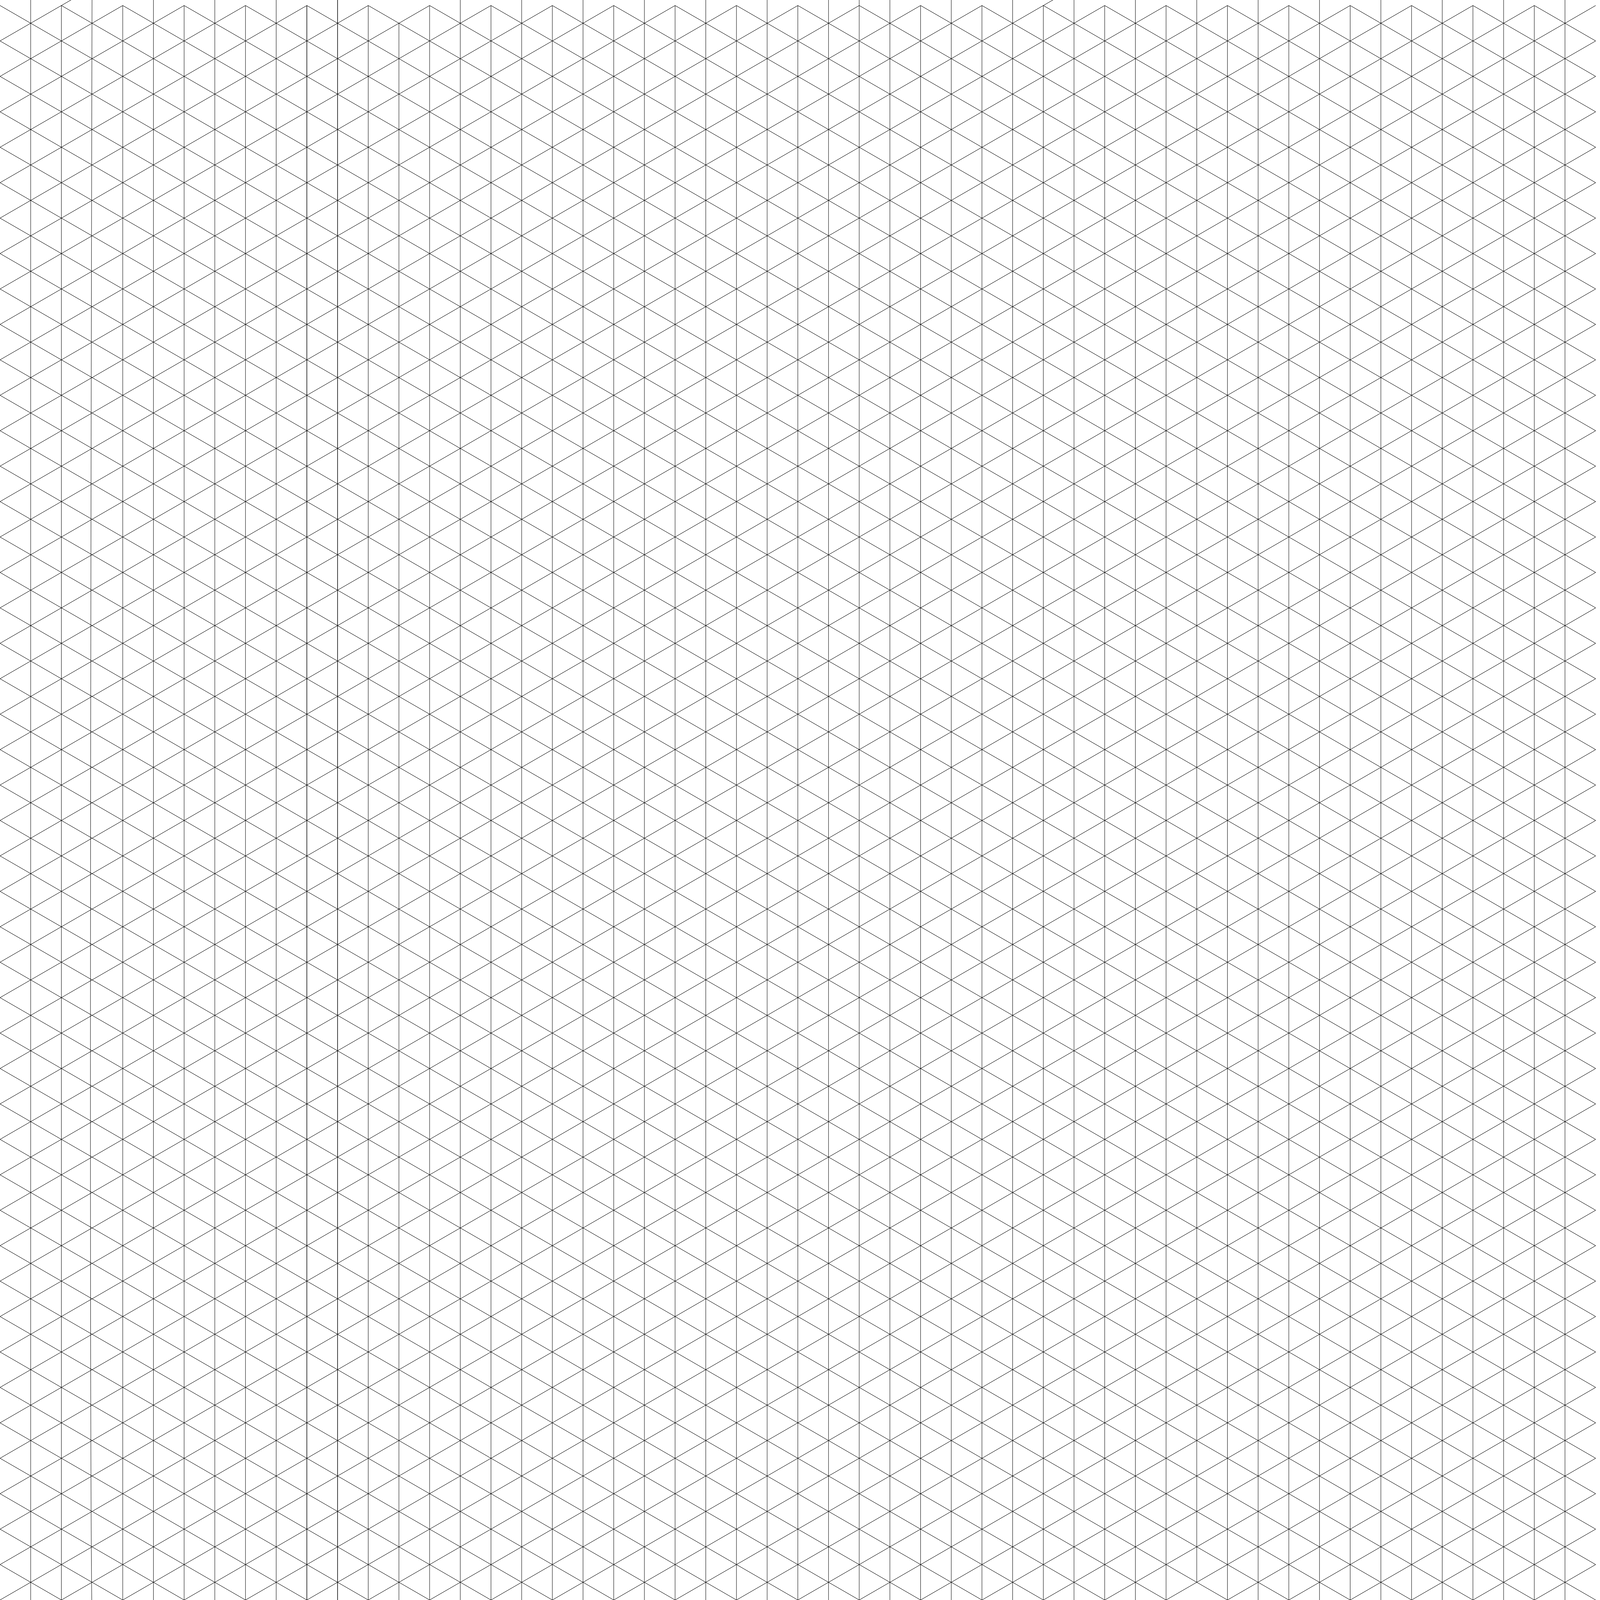 4,000x4,000 isometric grid by dcofjapan